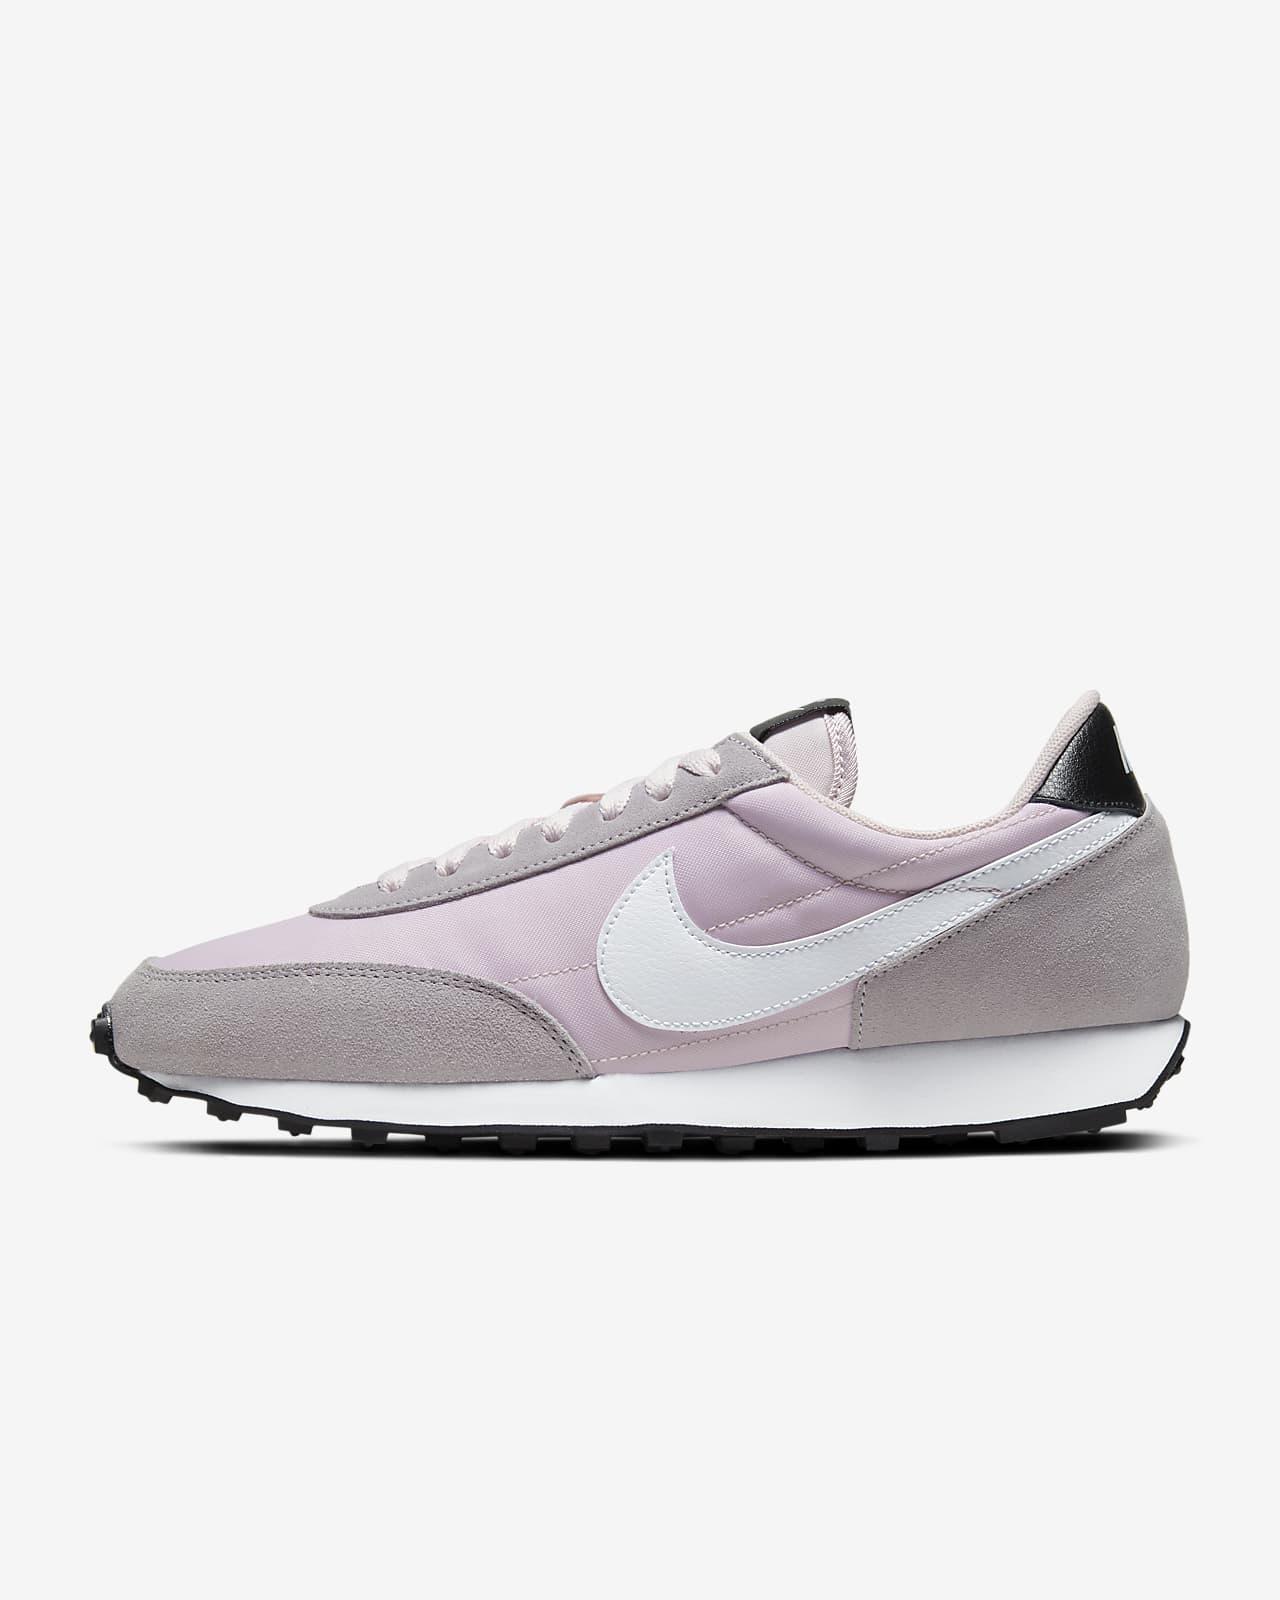 Sapatilhas Nike Daybreak para mulher